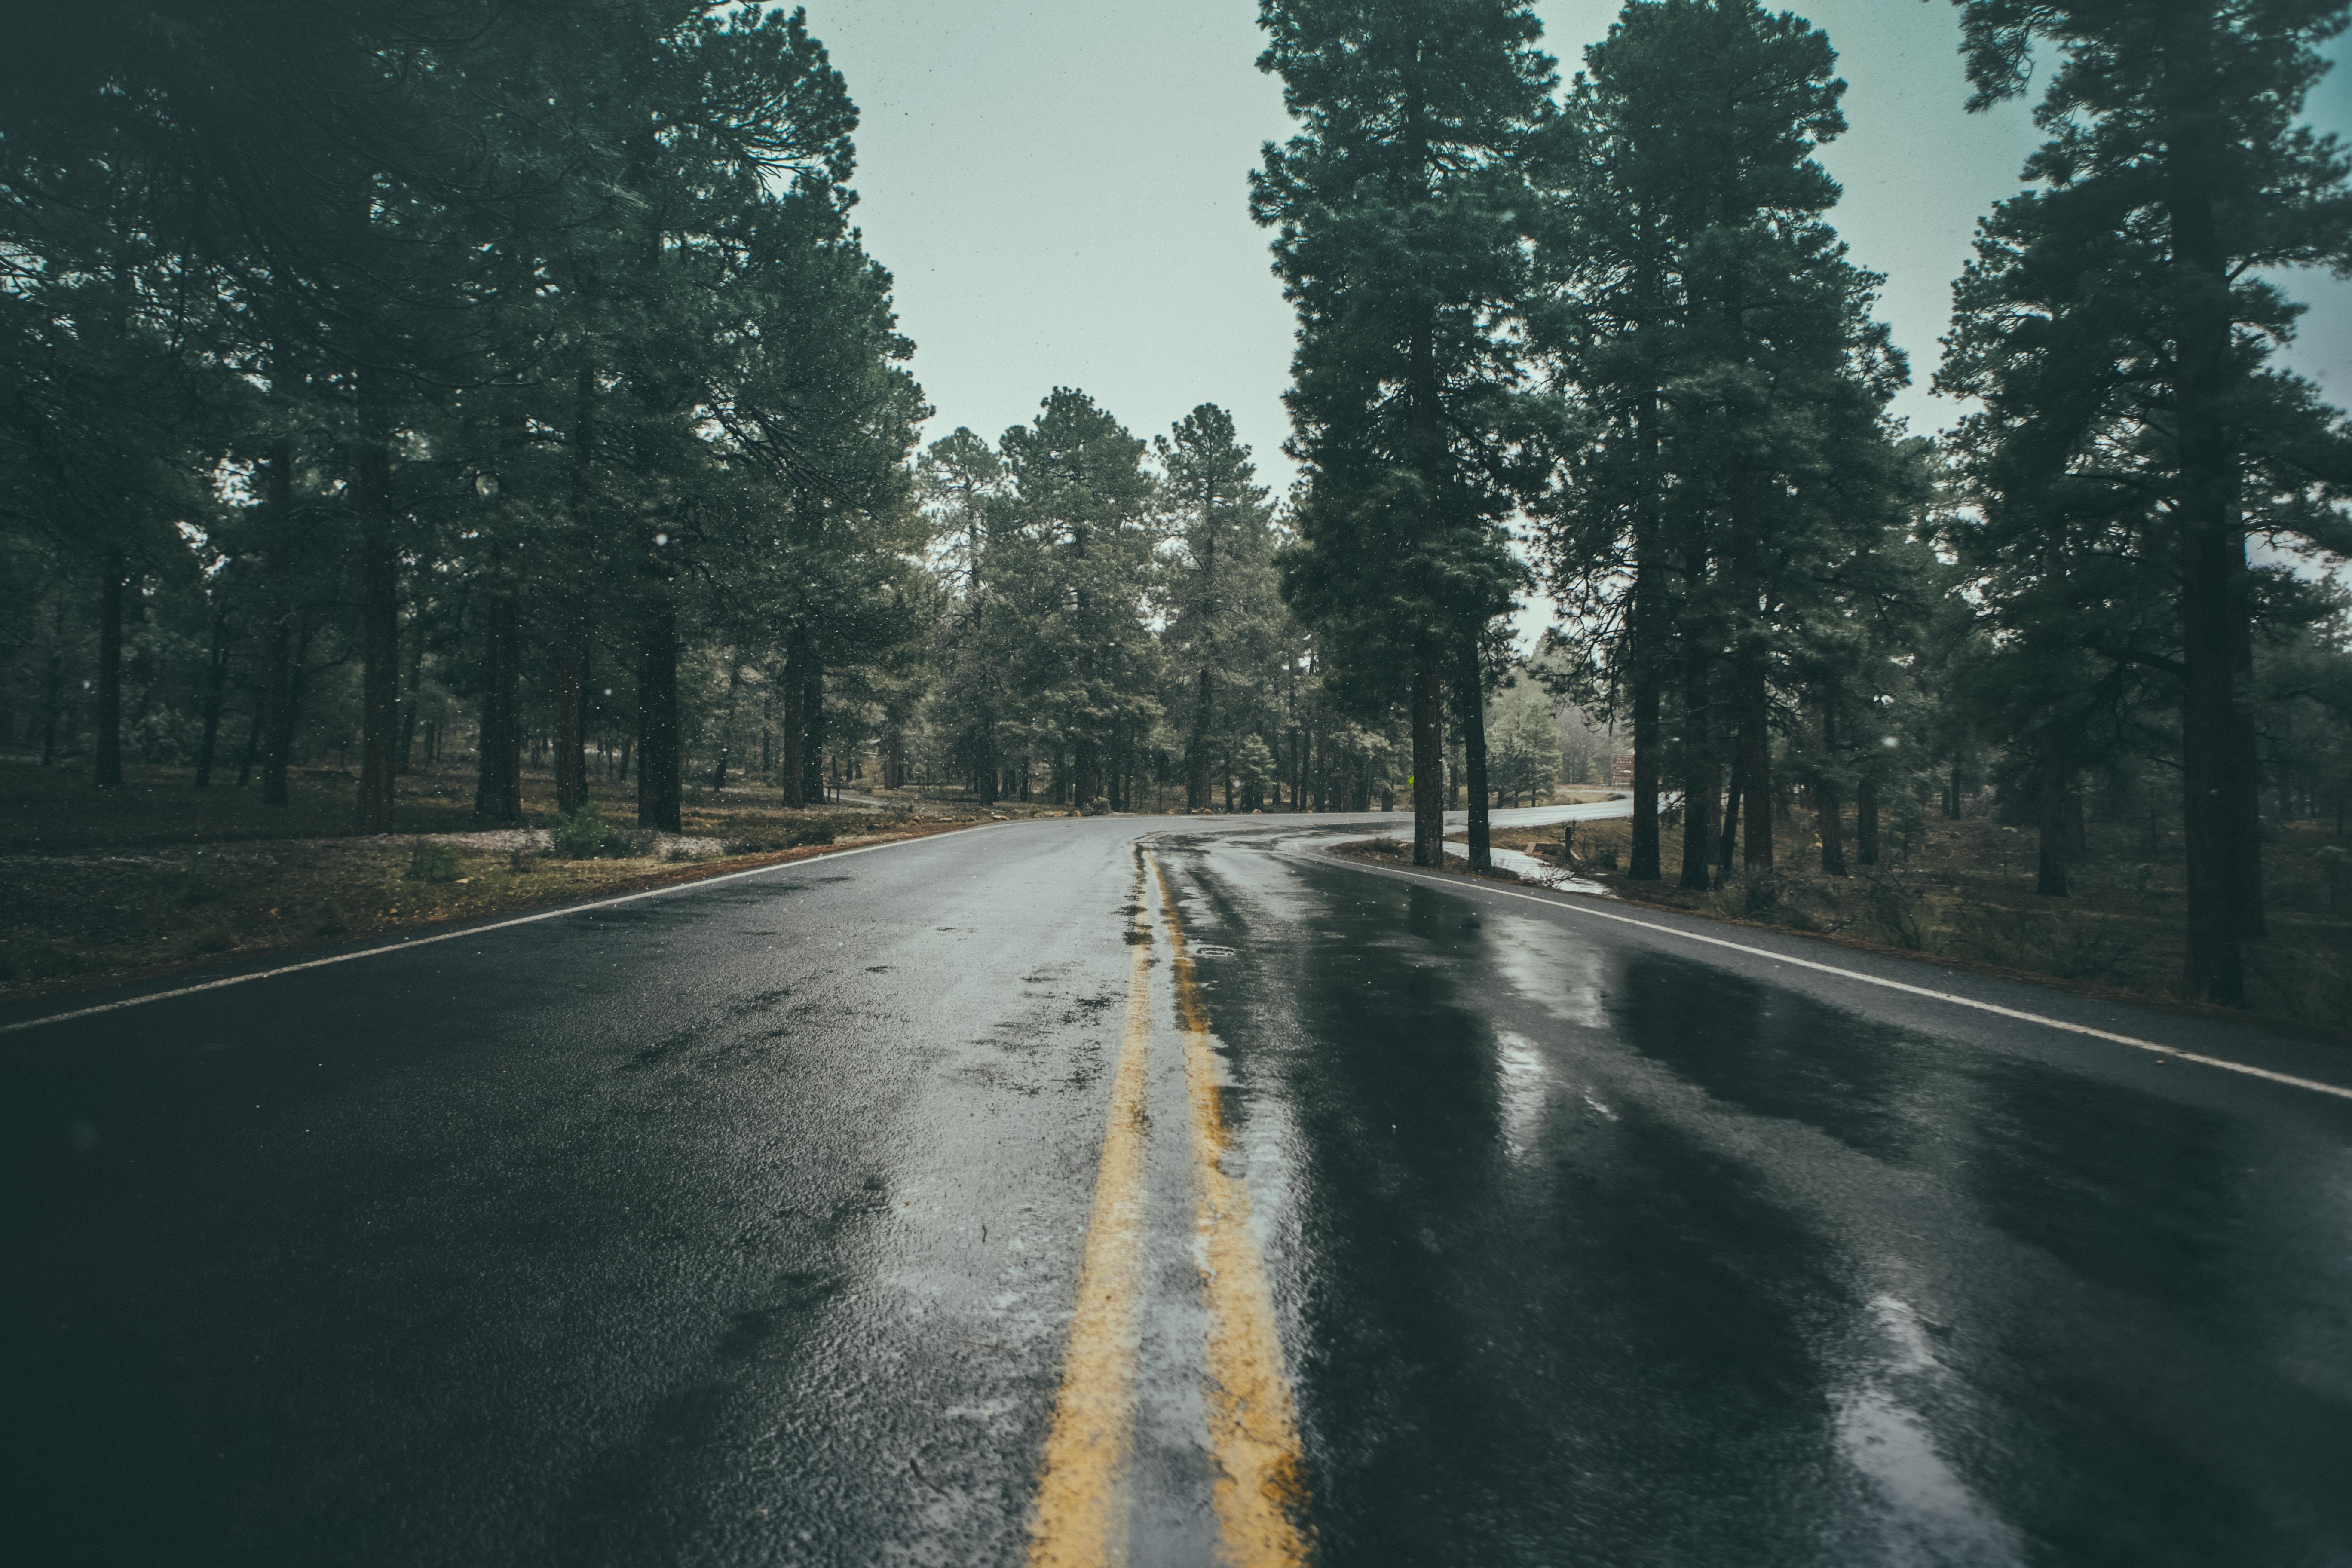 photography of wet asphalt road